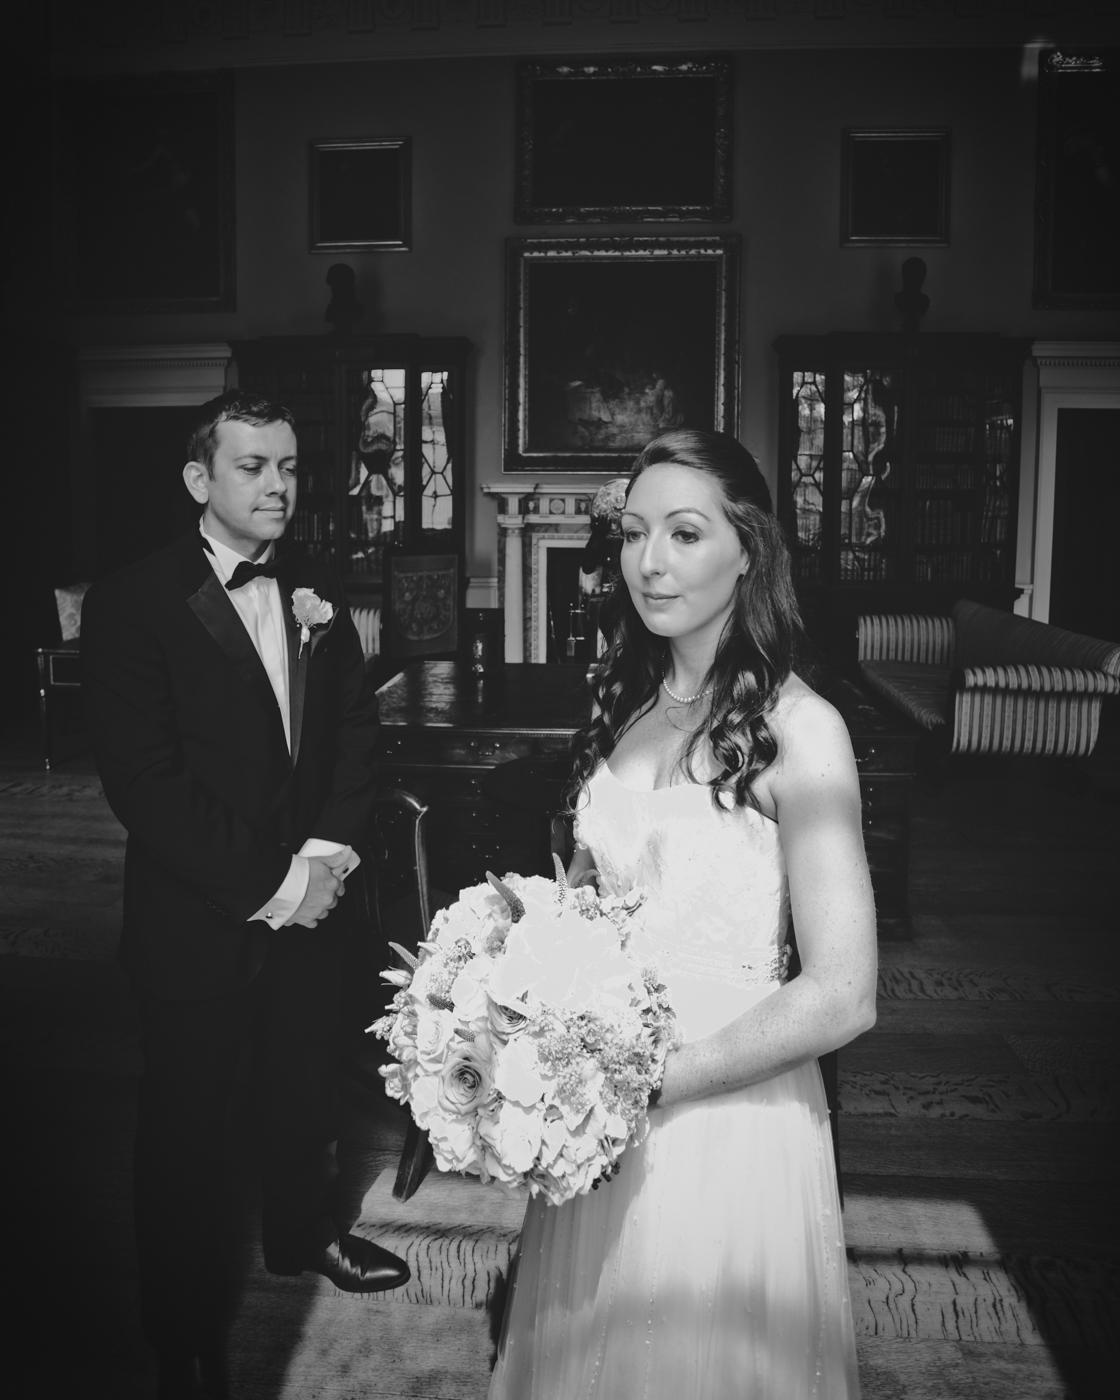 004 - Abi and Chris at Kedleston Hall - Wedding Photography by Mark Pugh www.markpugh.com - 0282.JPG